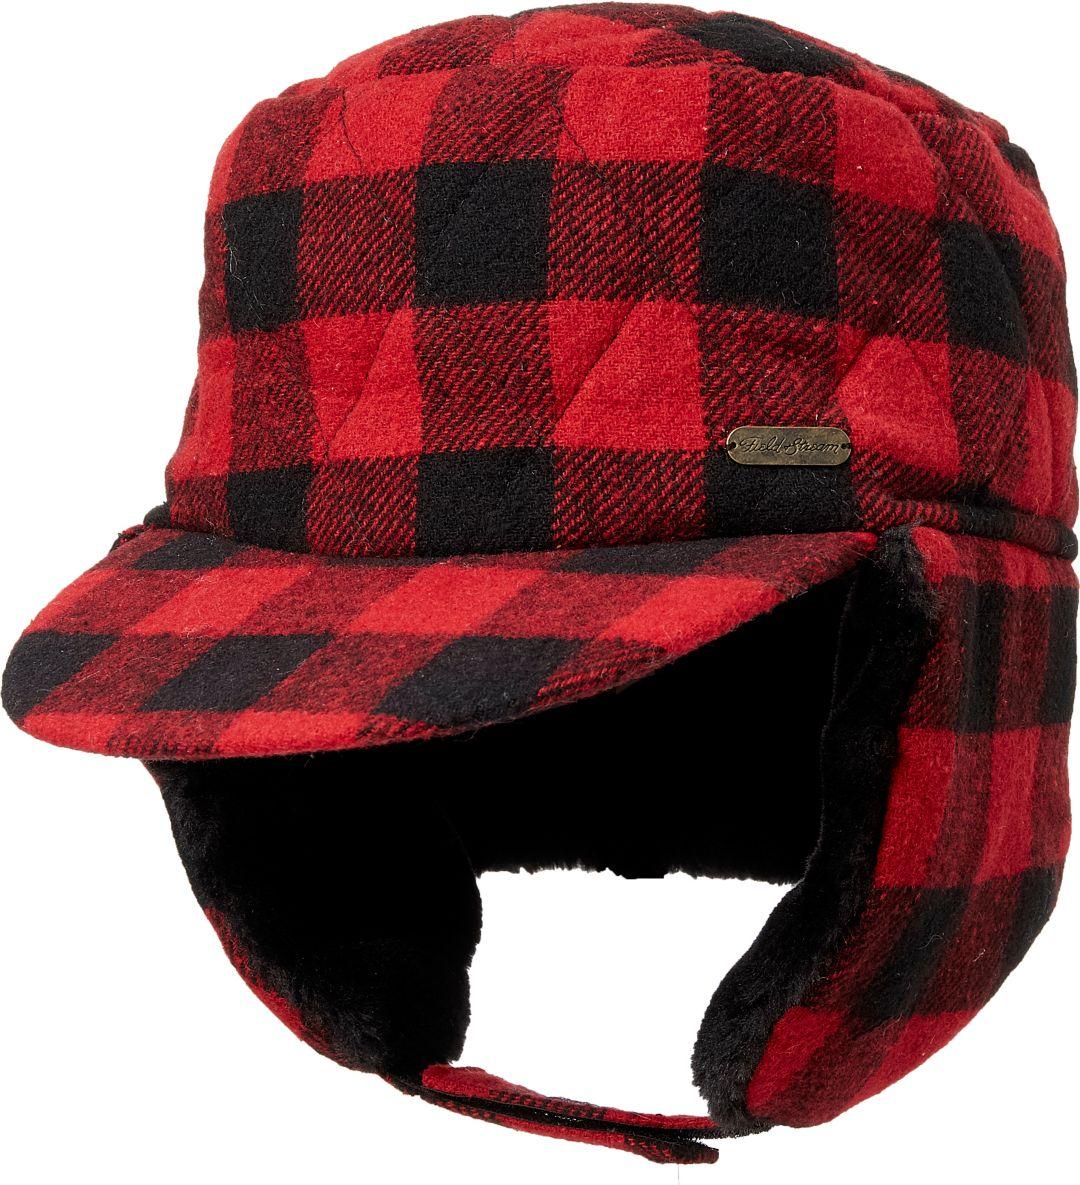 4d07ecc88a7c28 Field & Stream Men's Ear Flap Trapper Hat   DICK'S Sporting Goods